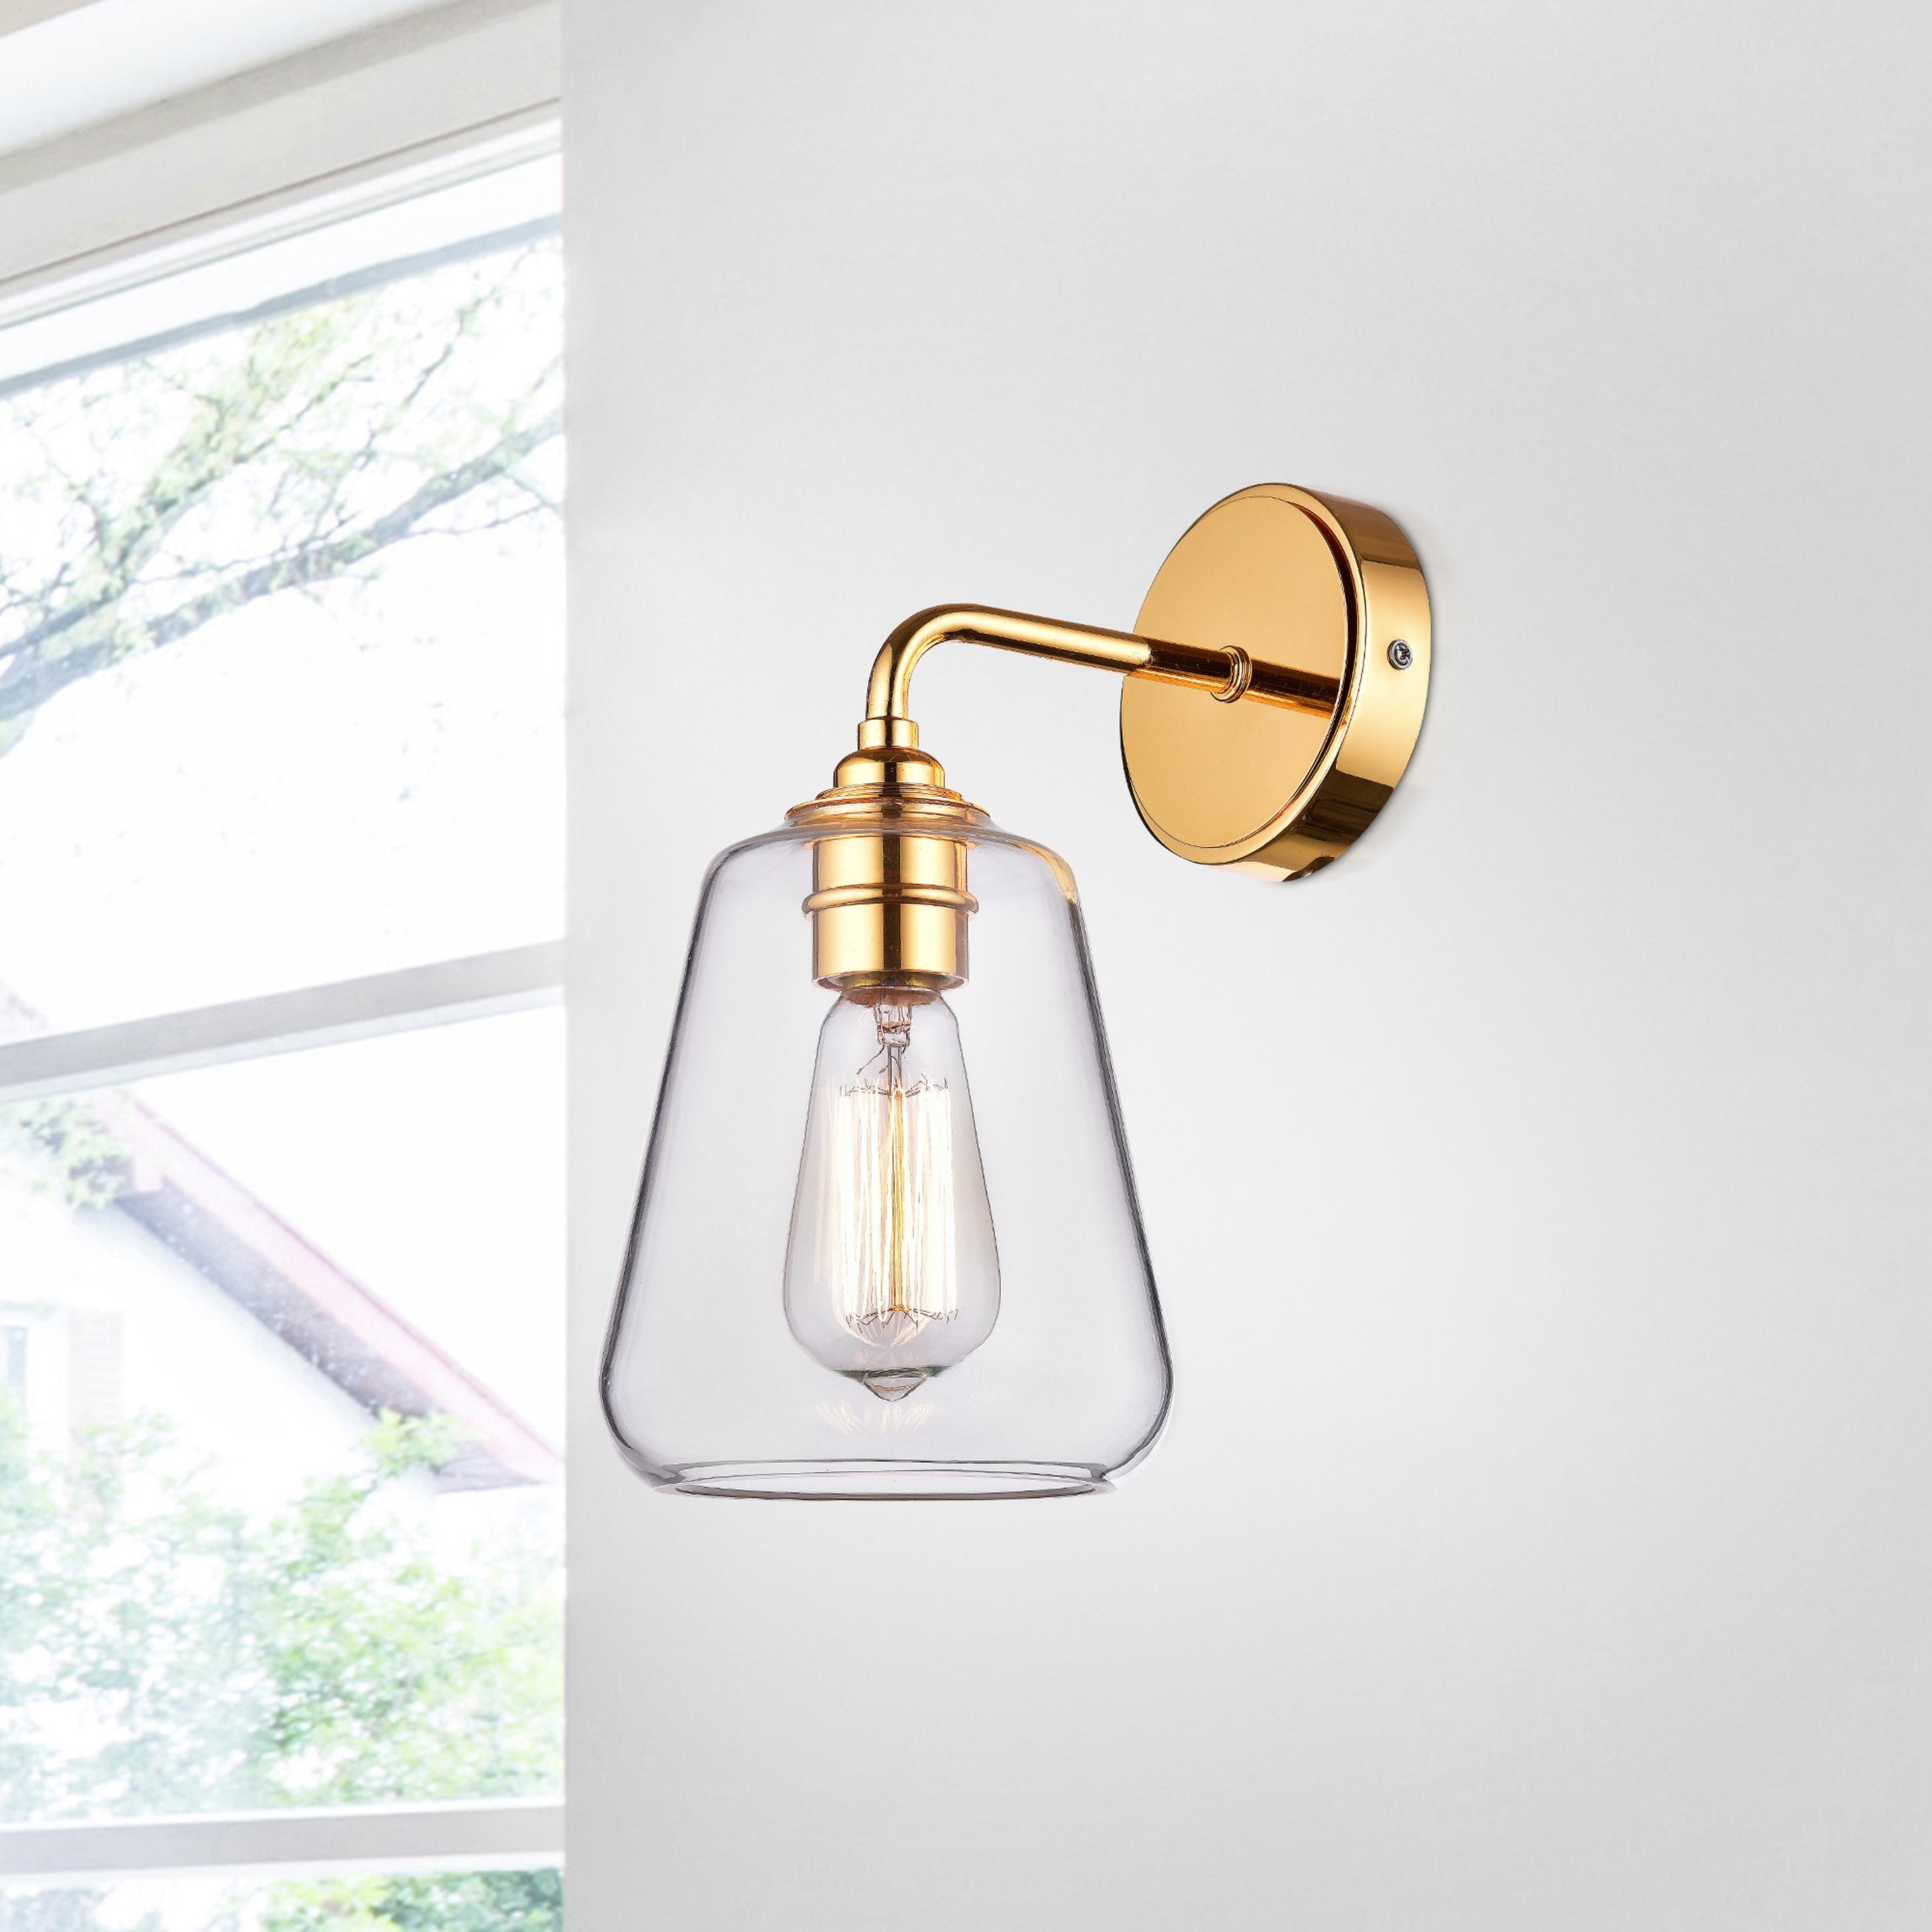 sconce lighting worlds away haley sconces wall gold catalog izzo lamp matthew metal c